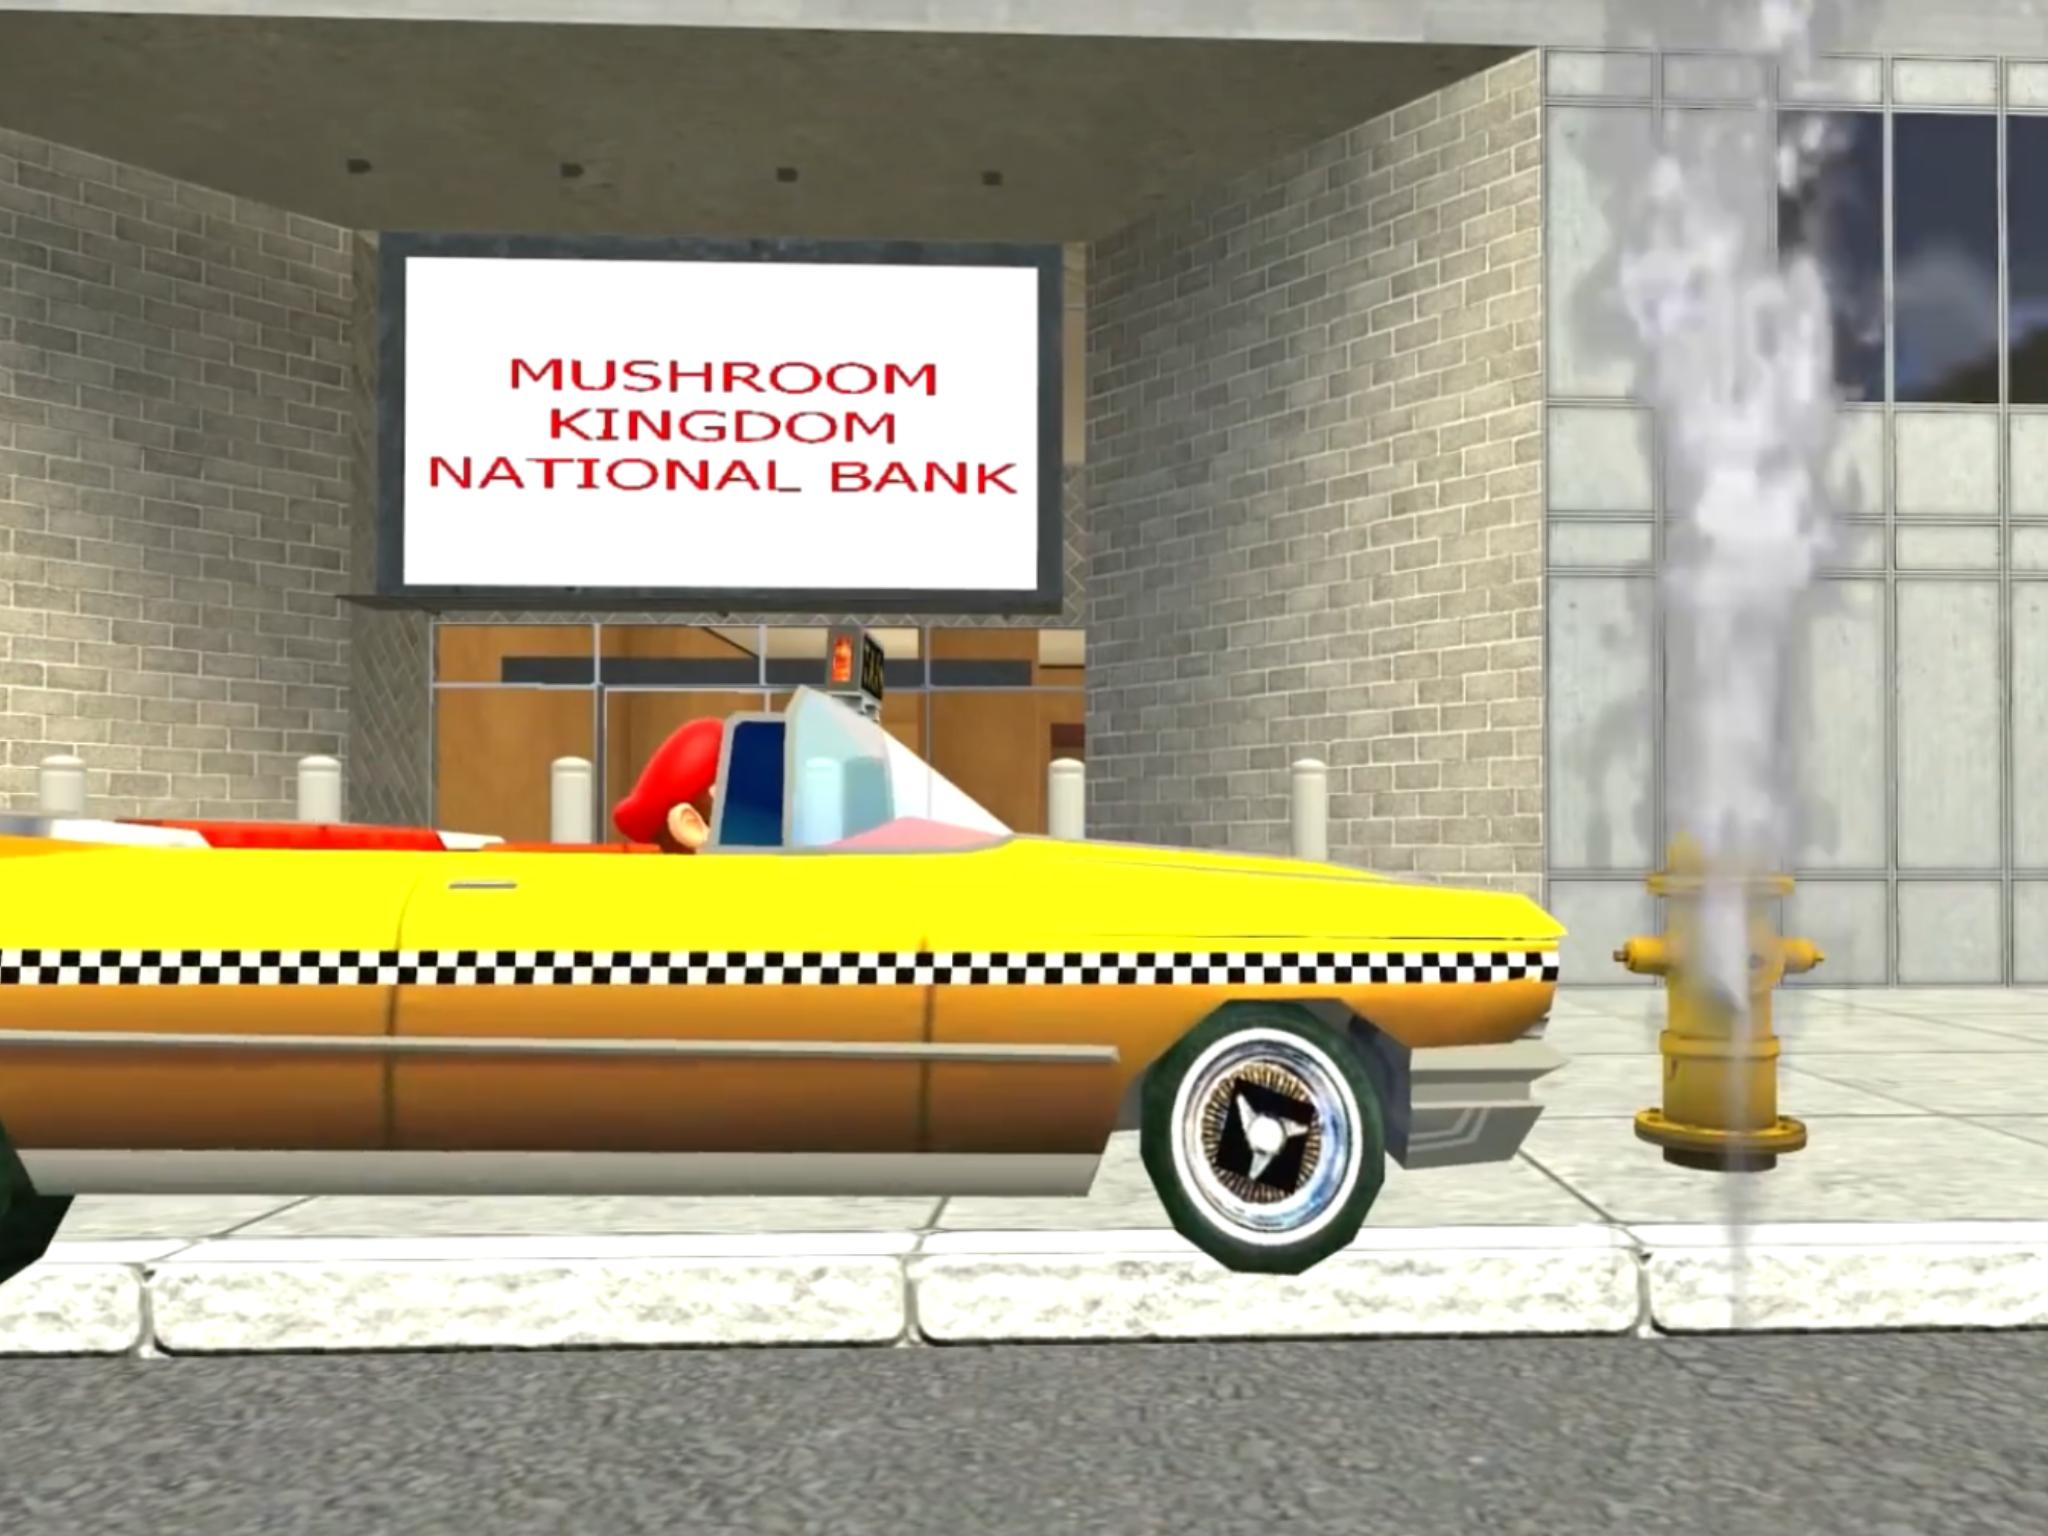 Mushroom Kingdom National Bank